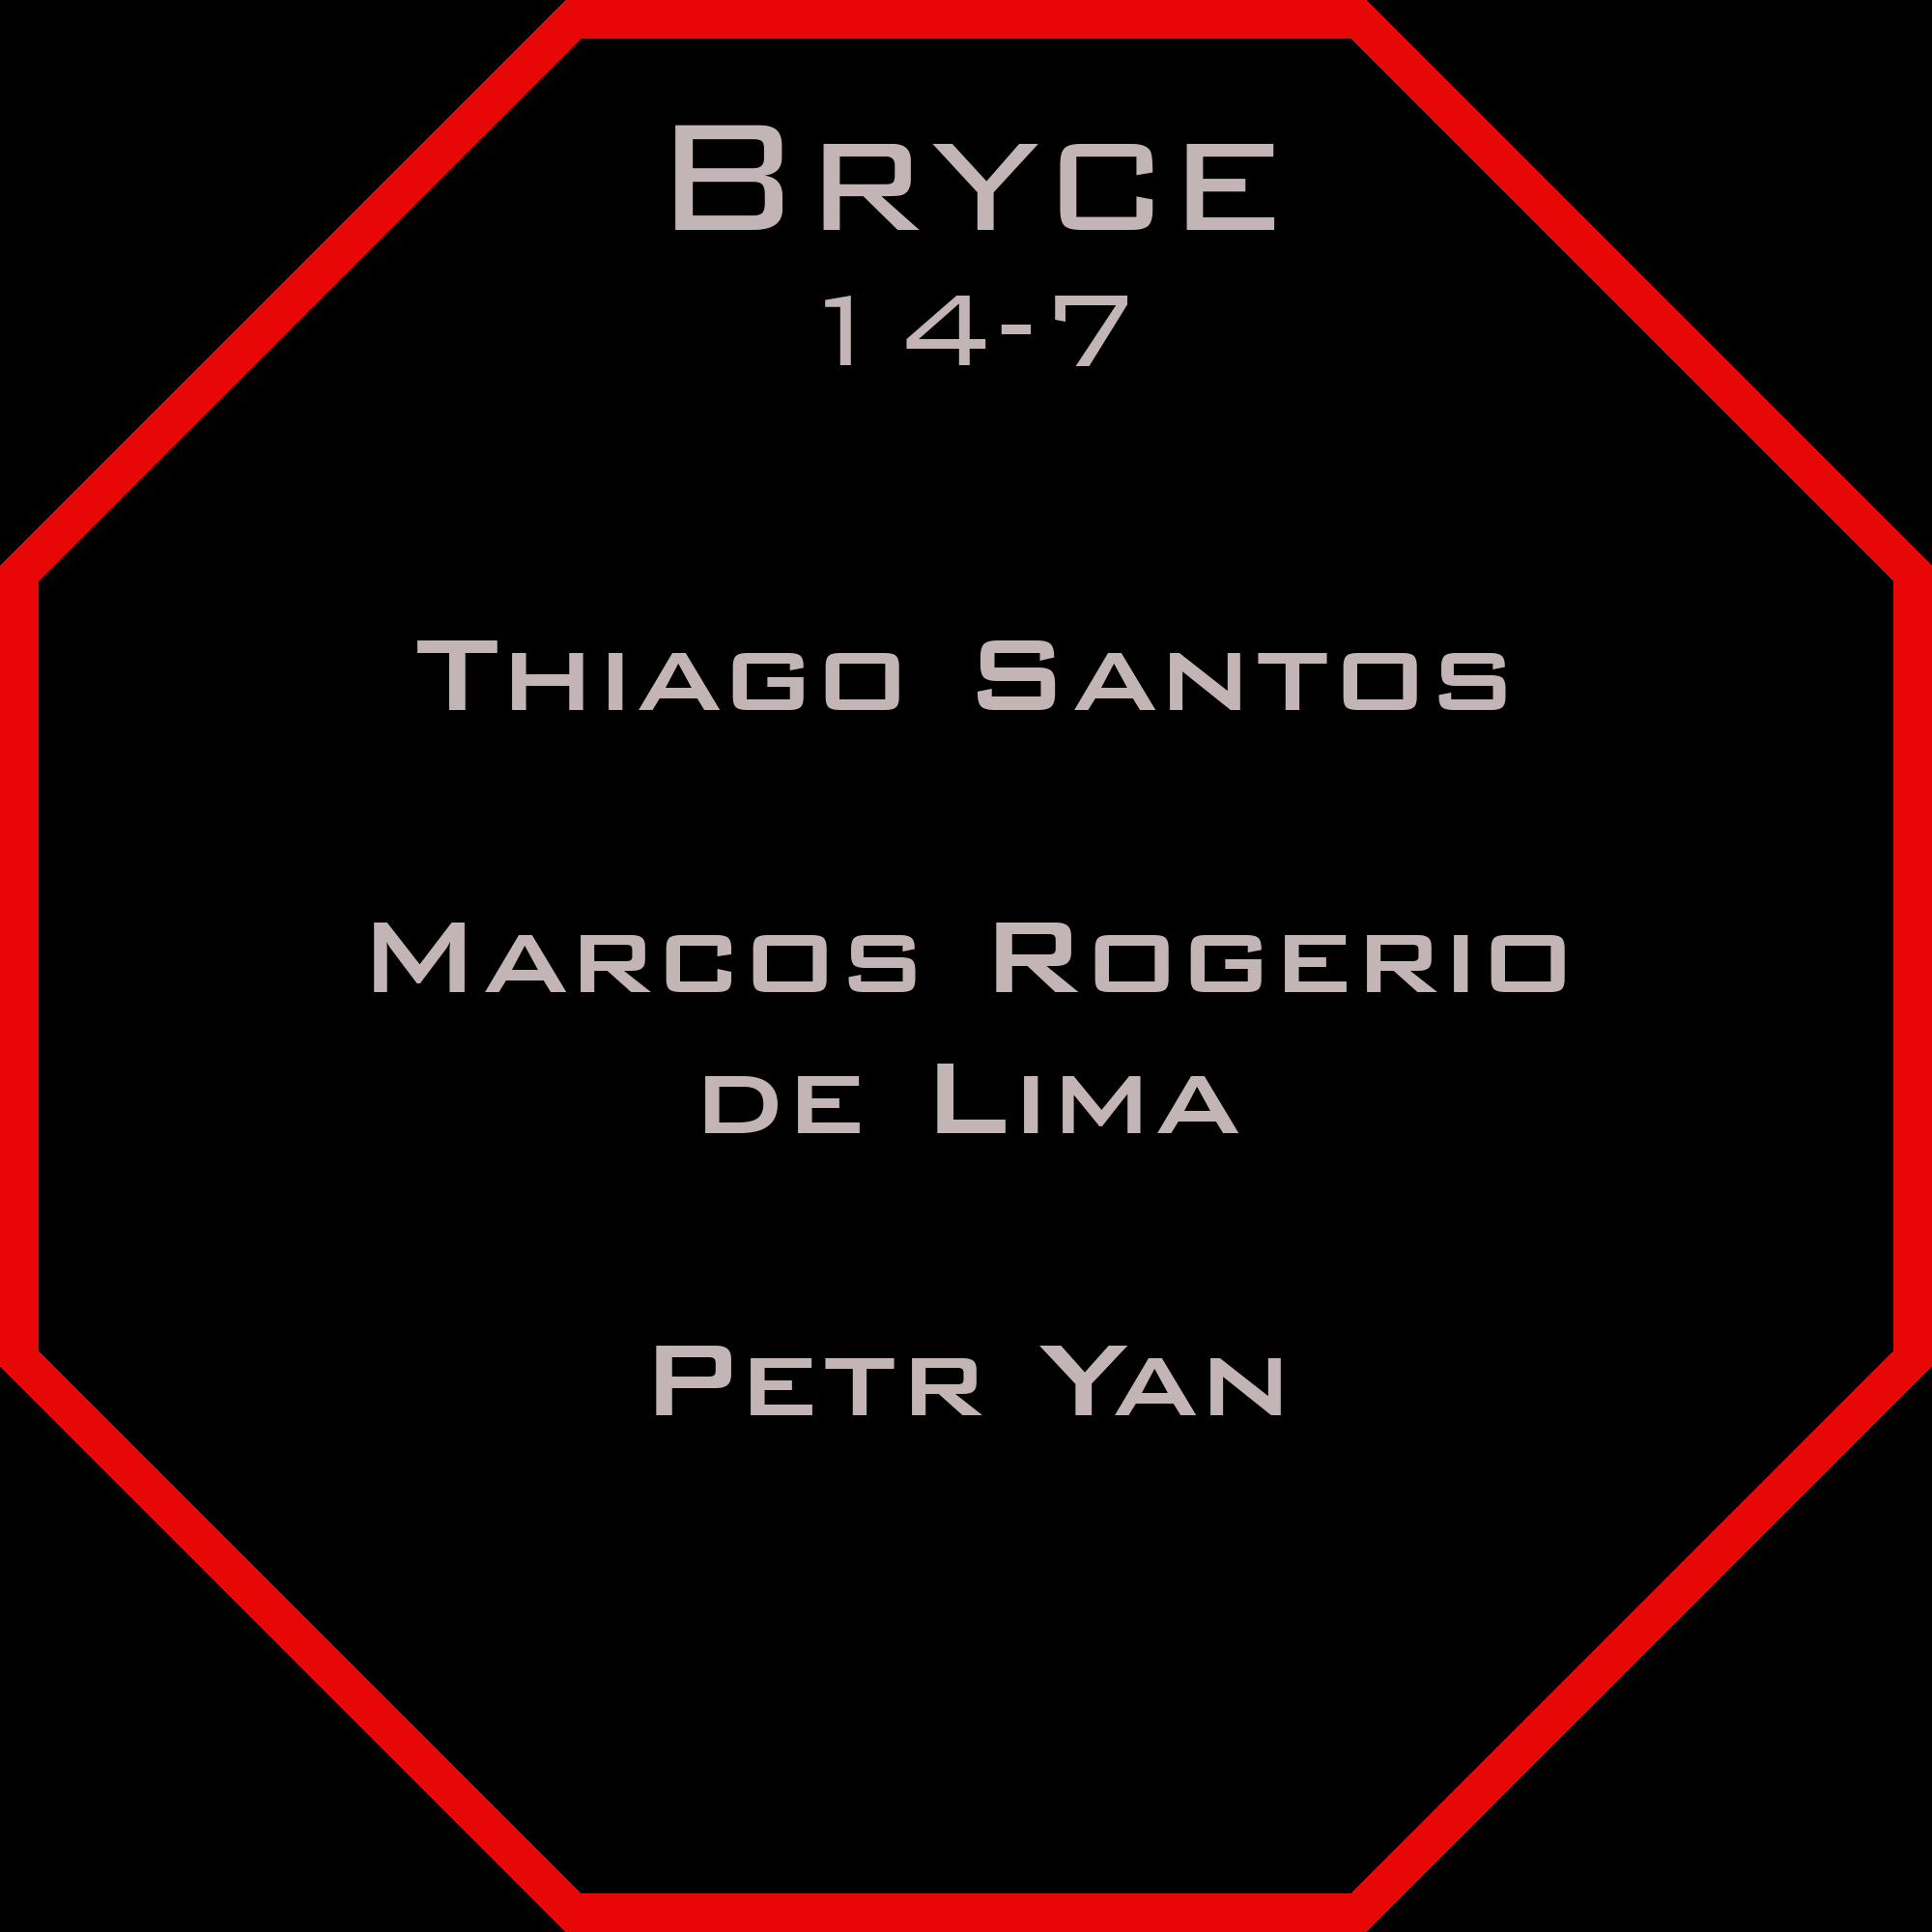 bryce prague.png